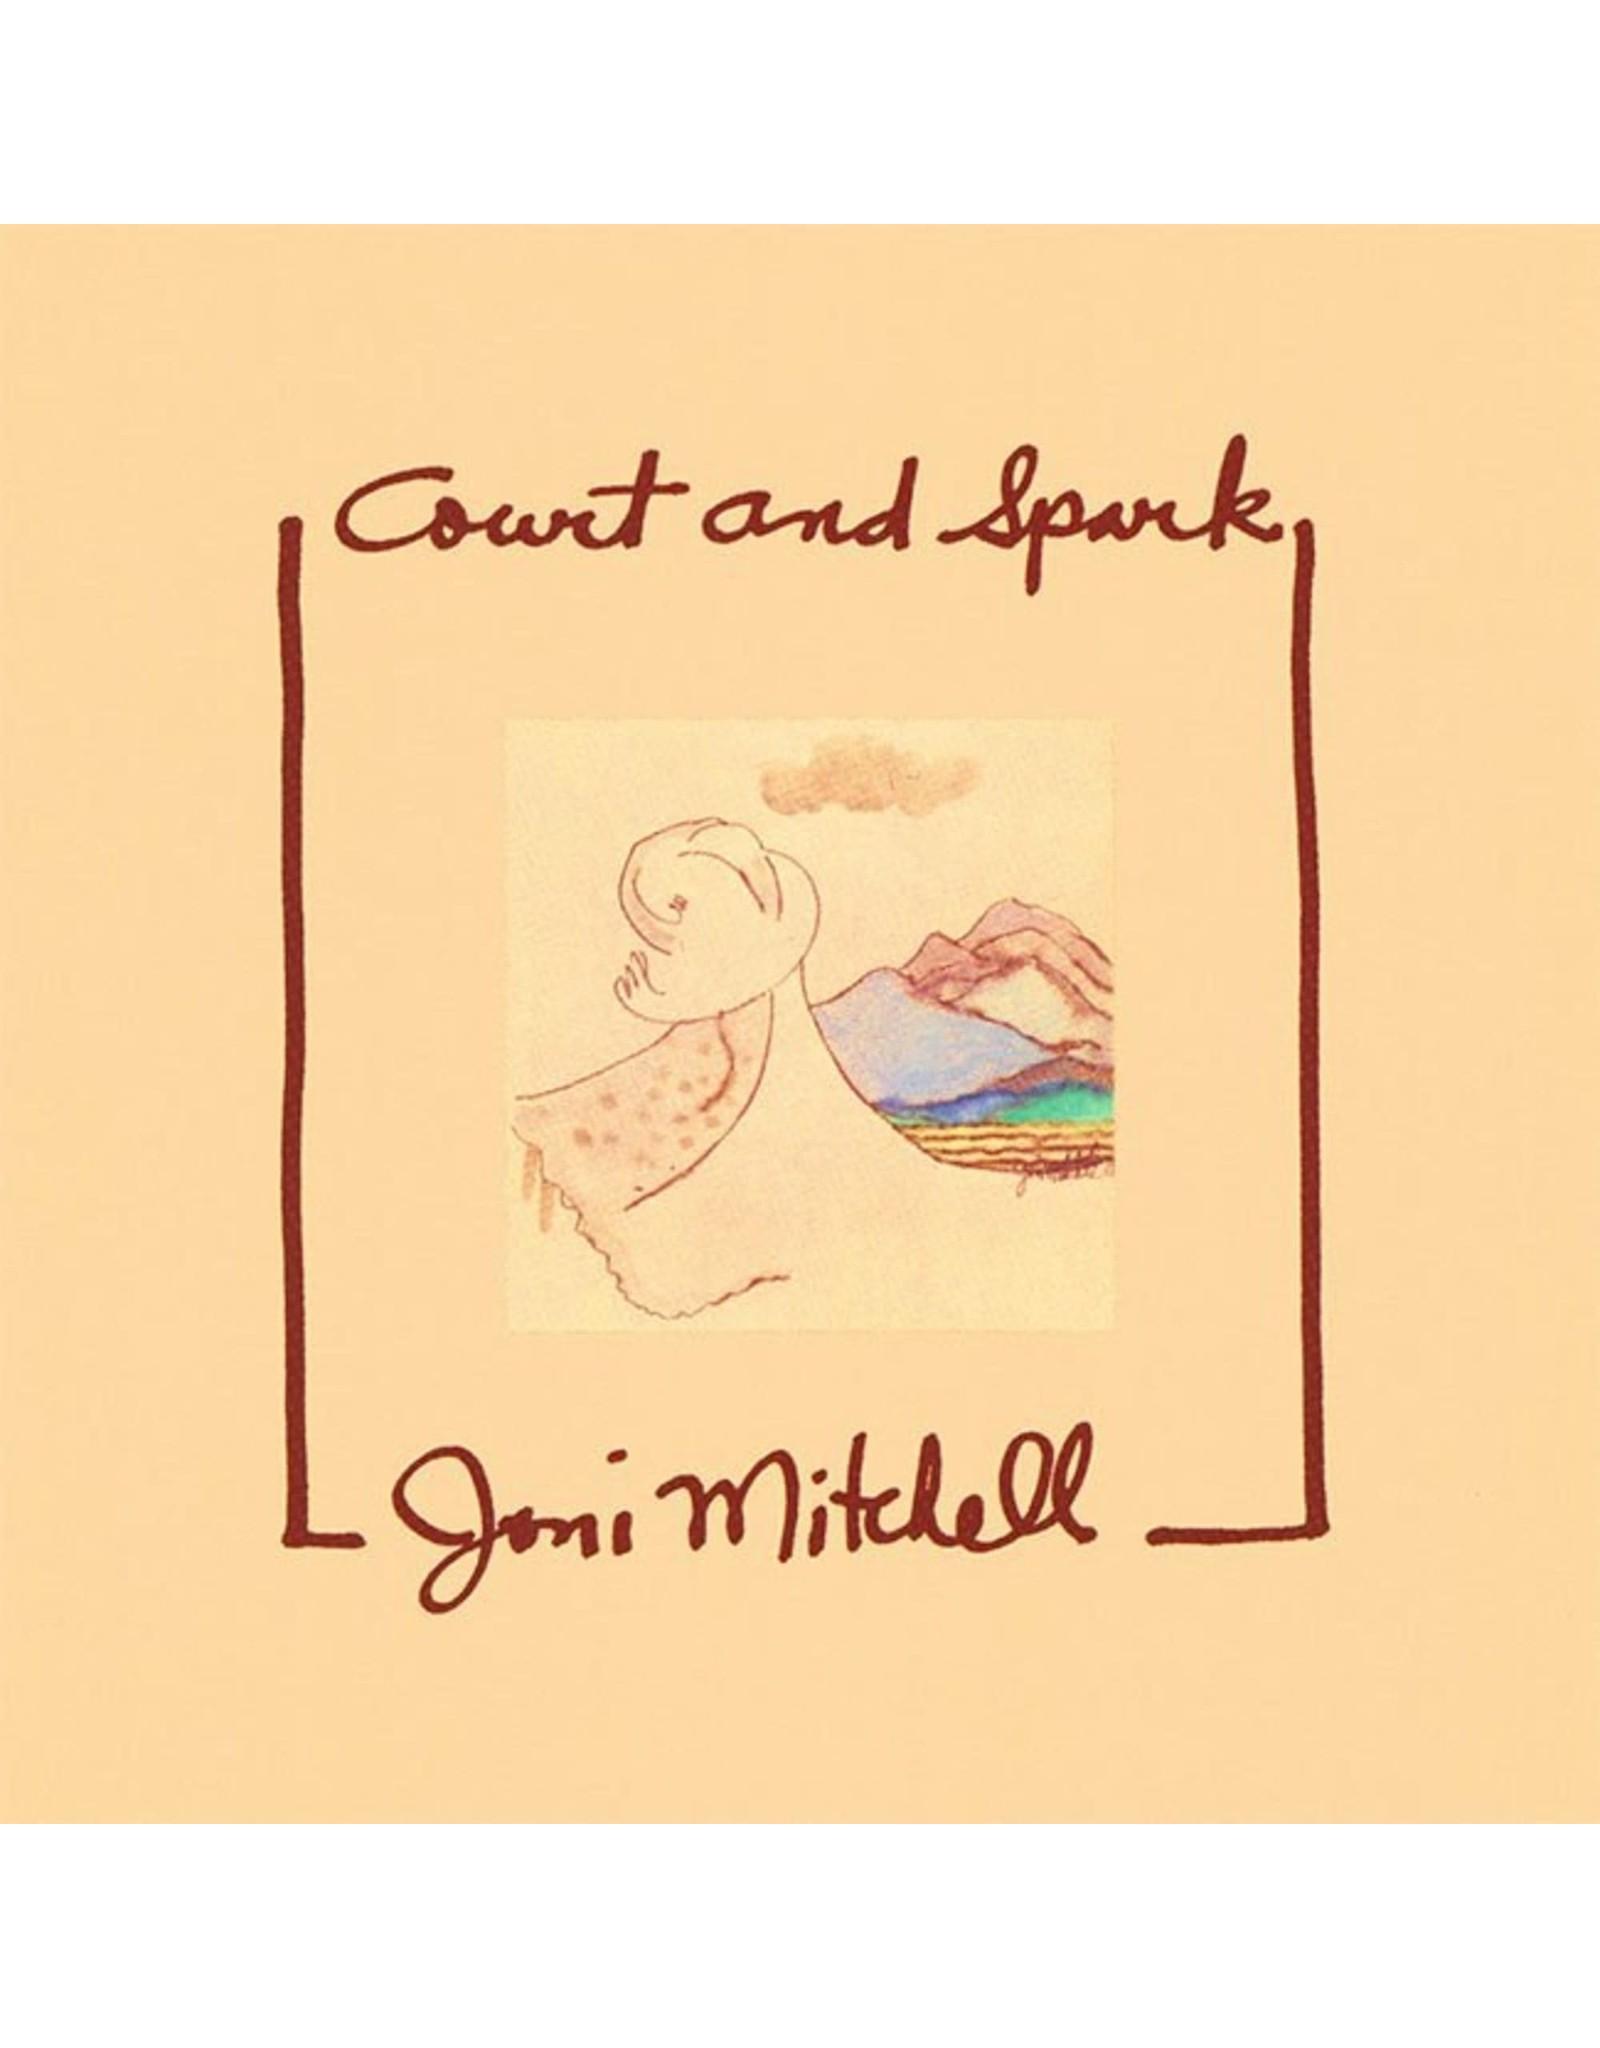 Joni Mitchell - Court and Spark